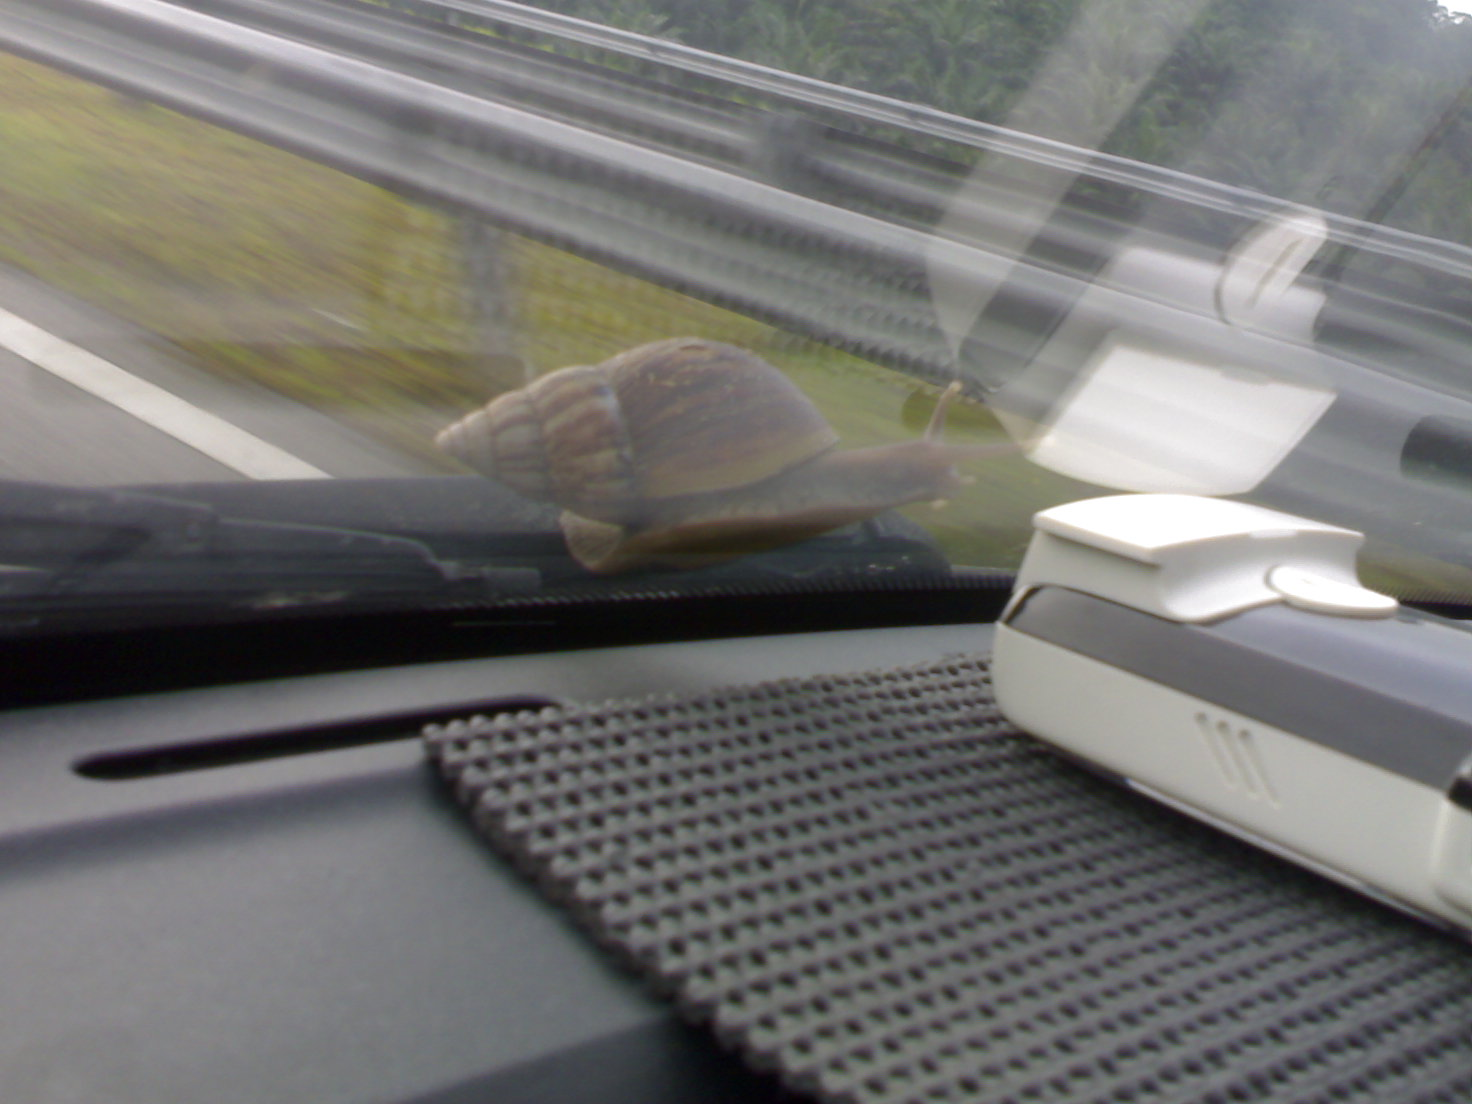 A better view of the climbing snail